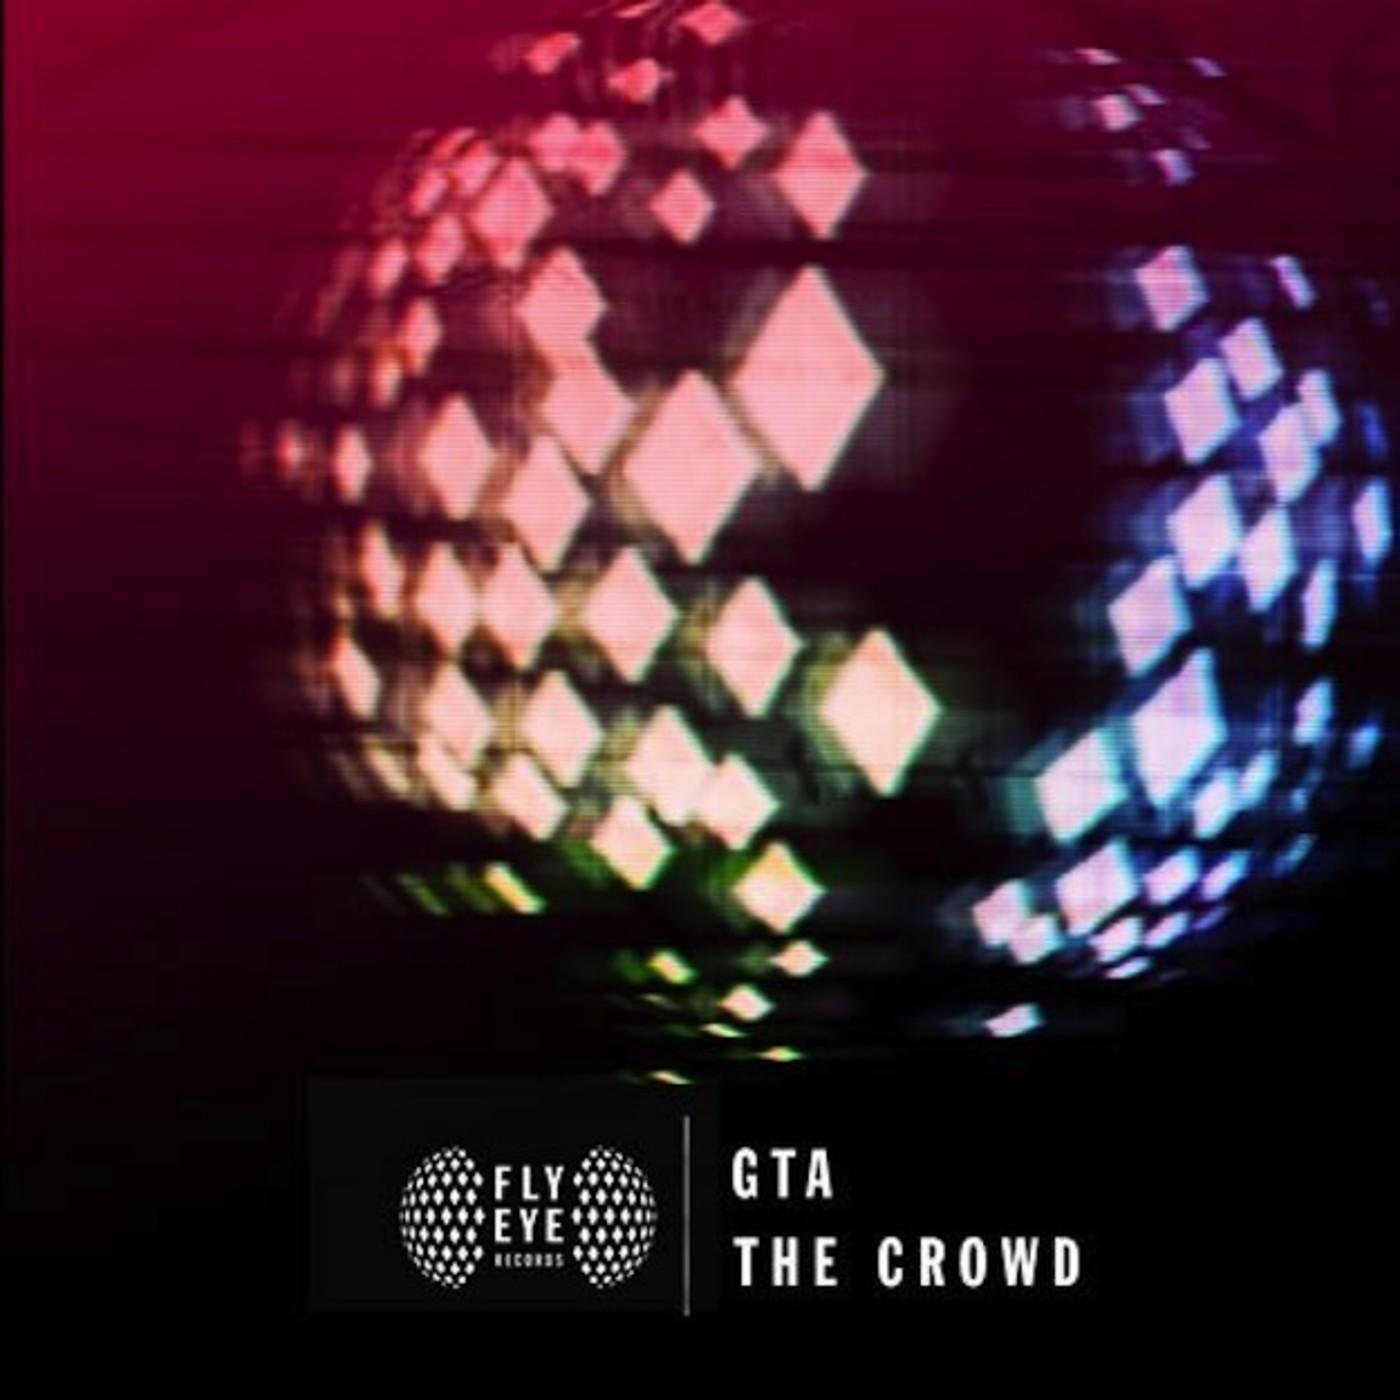 gta-the-crowd